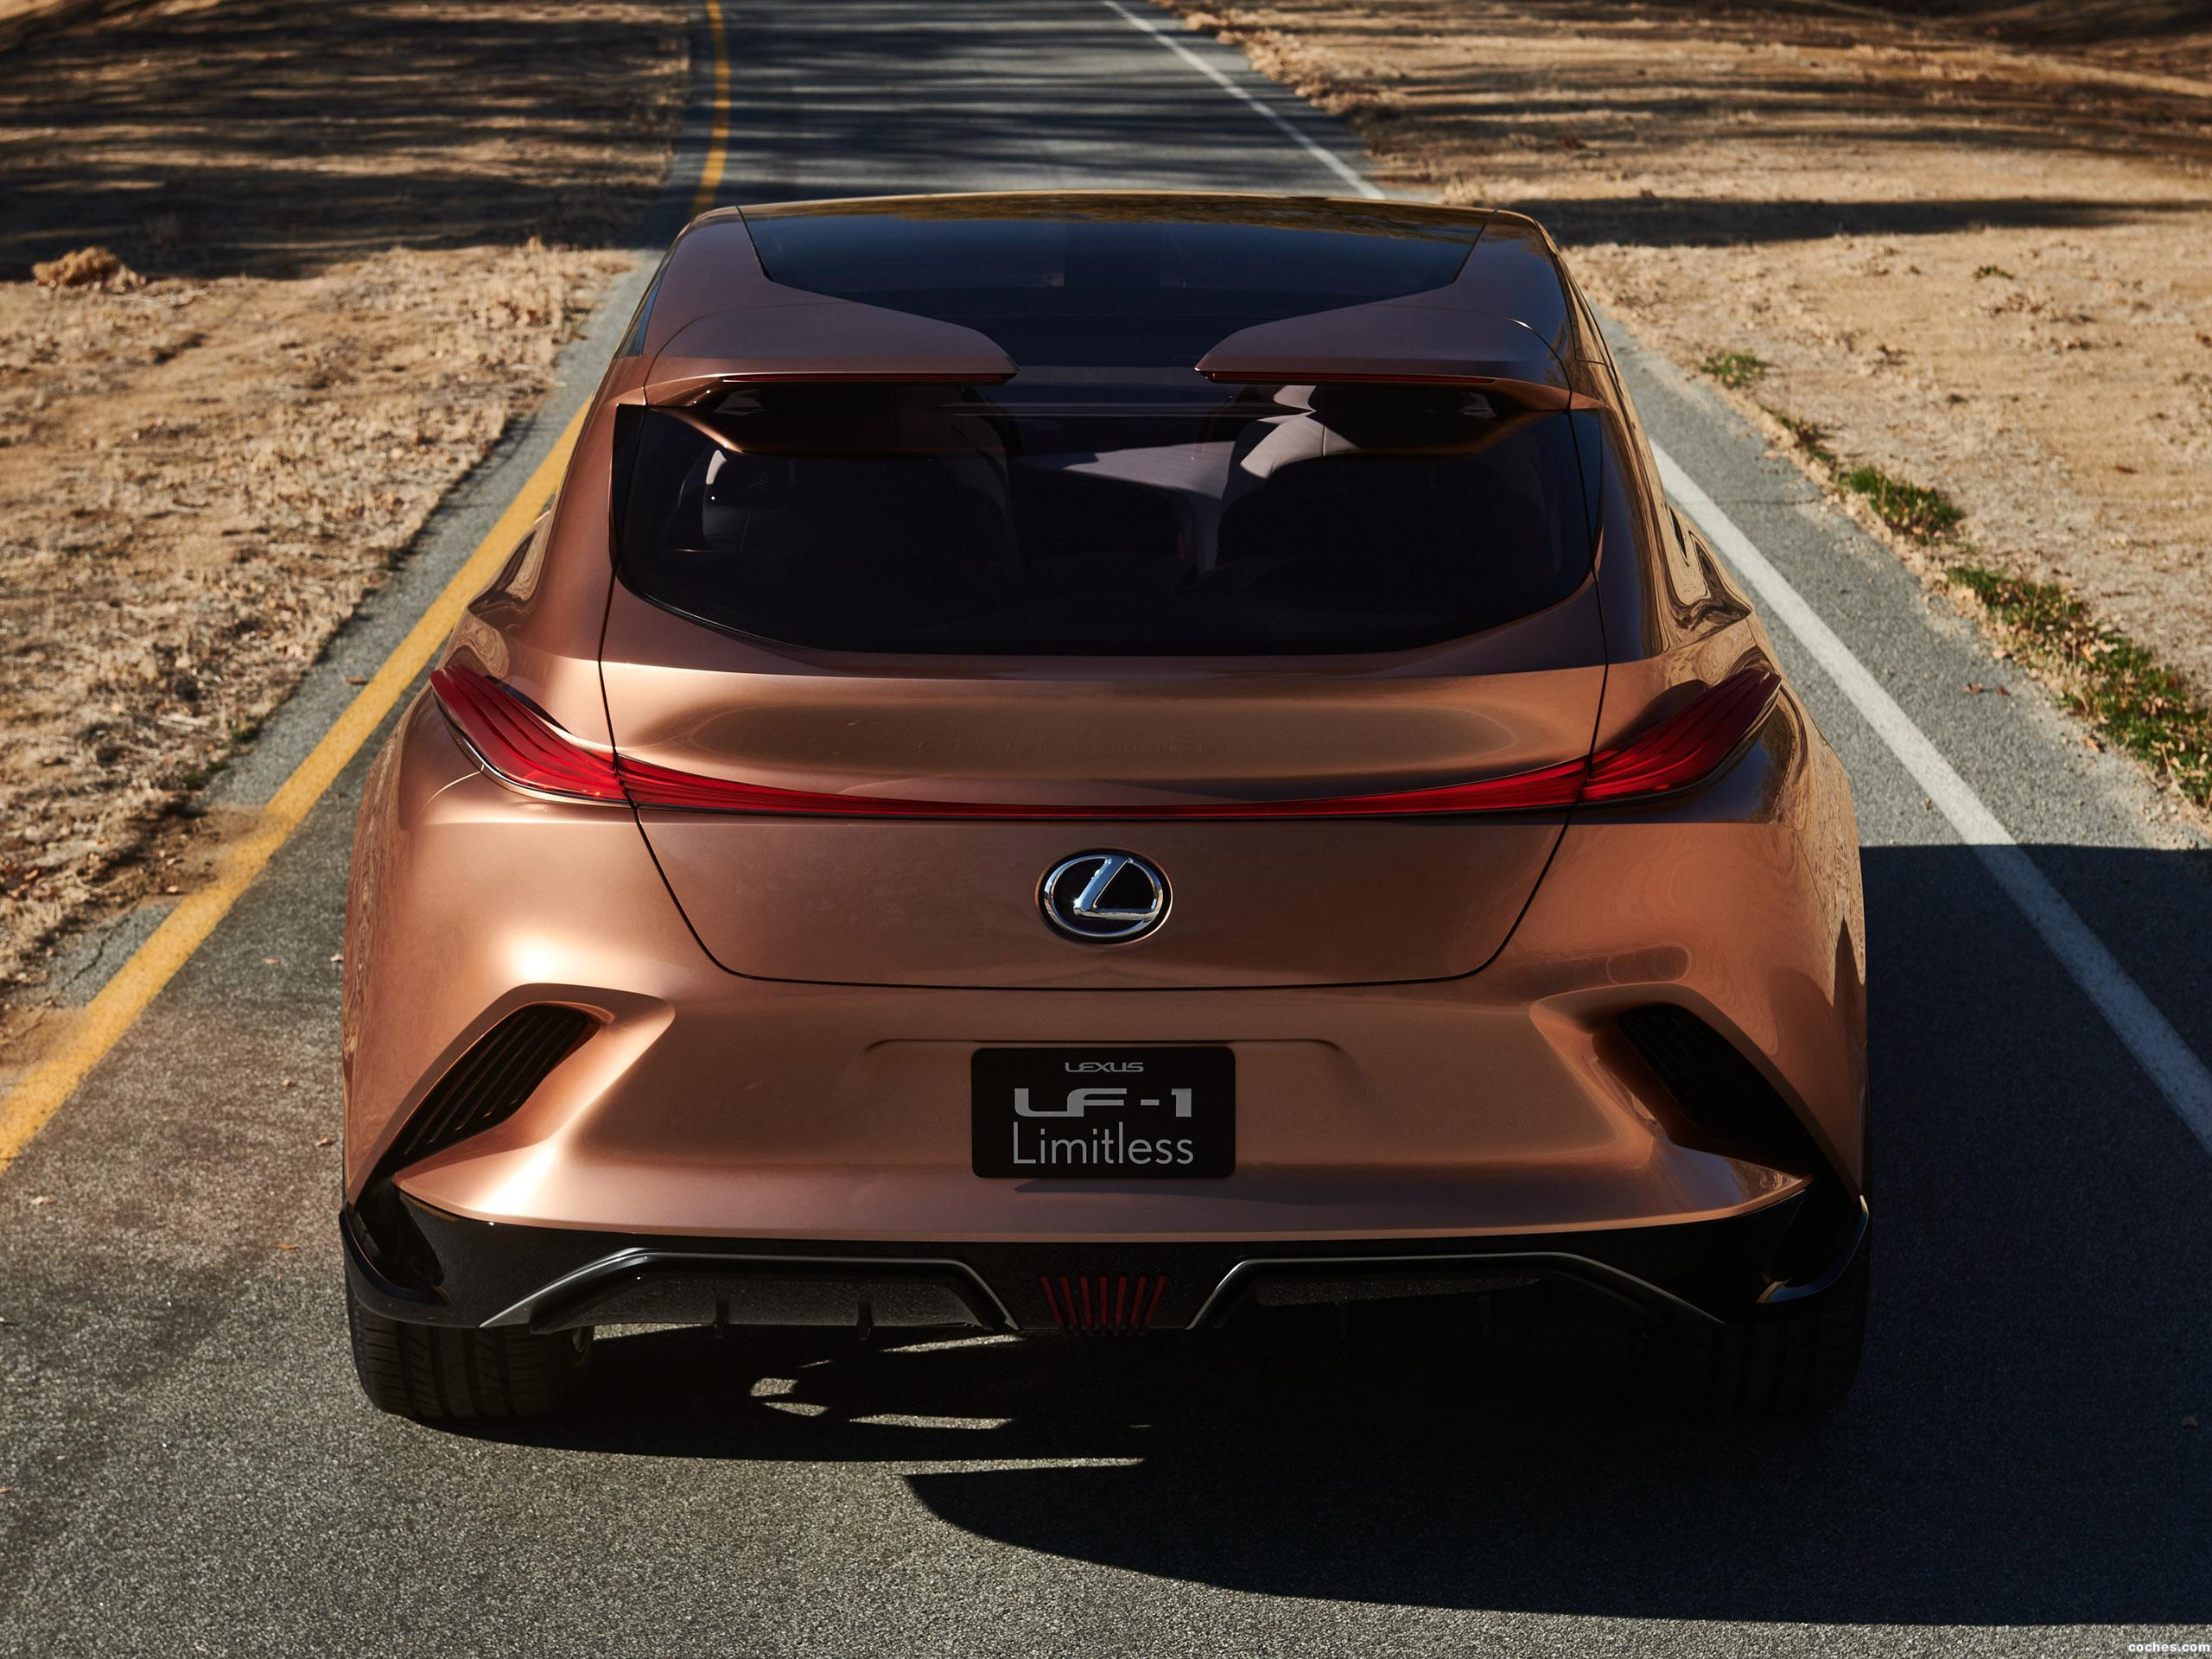 Foto 23 de Lexus LF-1 Limitless 2018